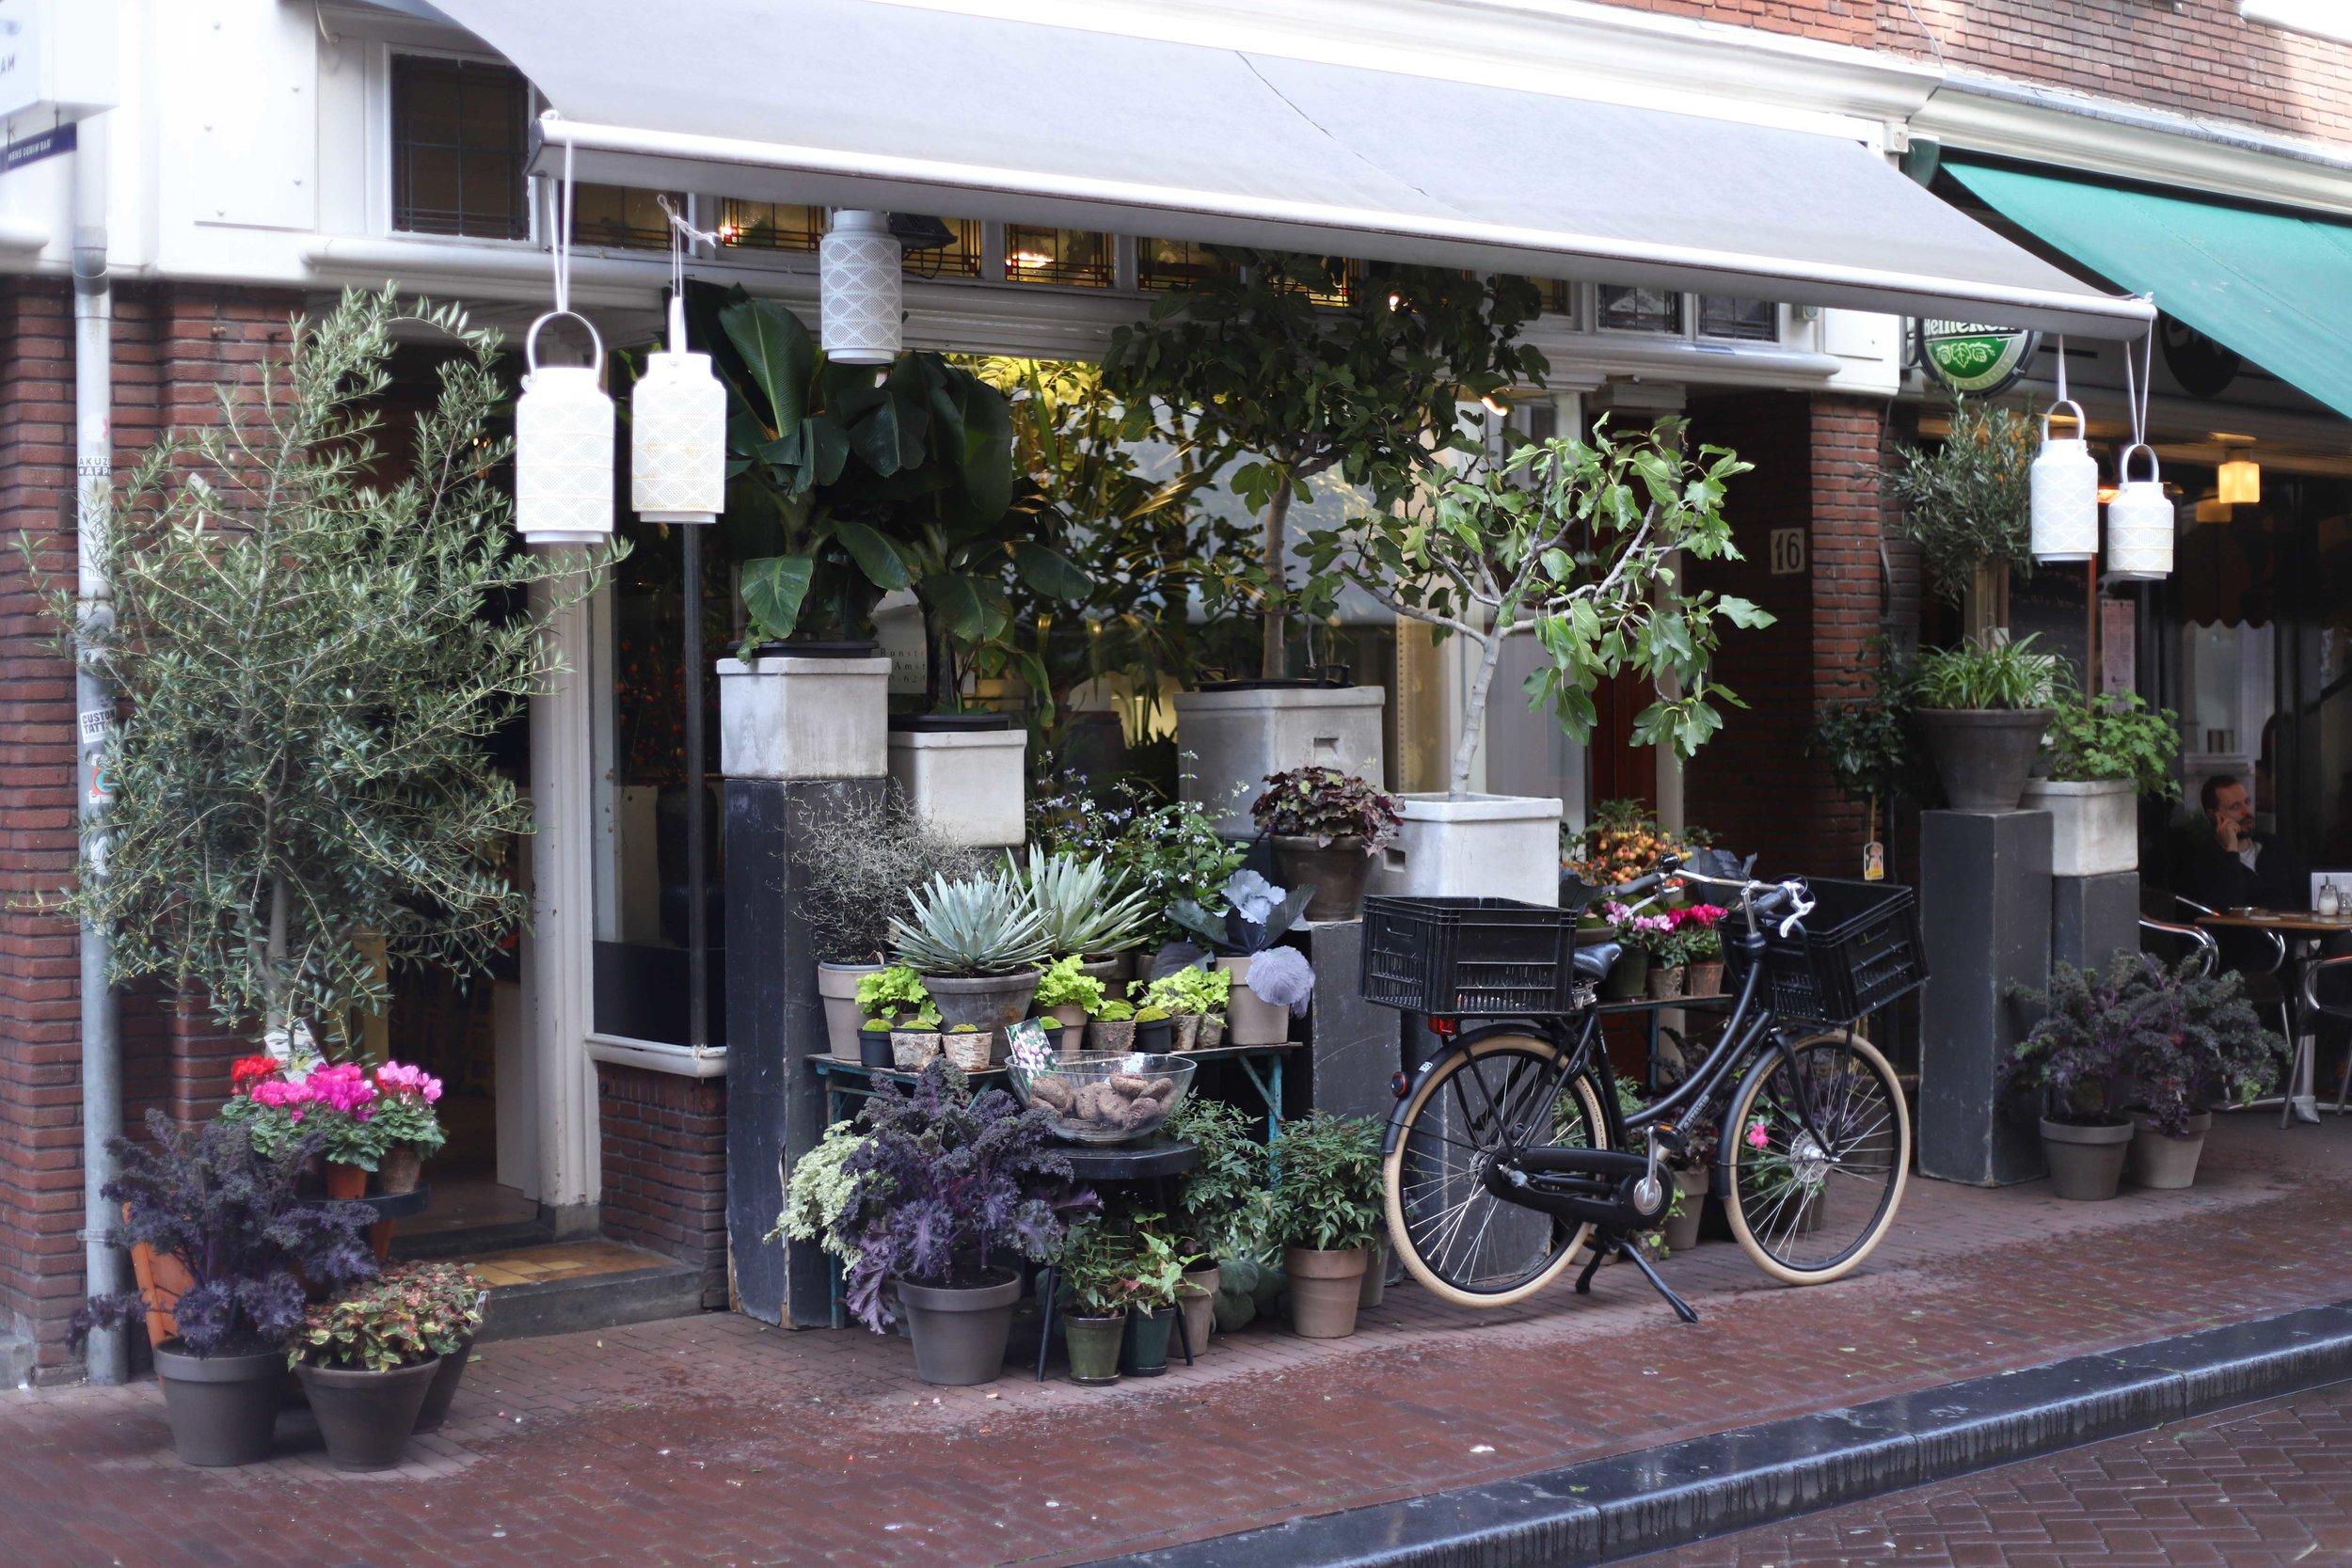 Gerda's flowers - Runstraat 16, De 9 StraatjesSee websiteOpening Hours:Mon-Fri: 9am-6pm / Sat: 9am-7pm